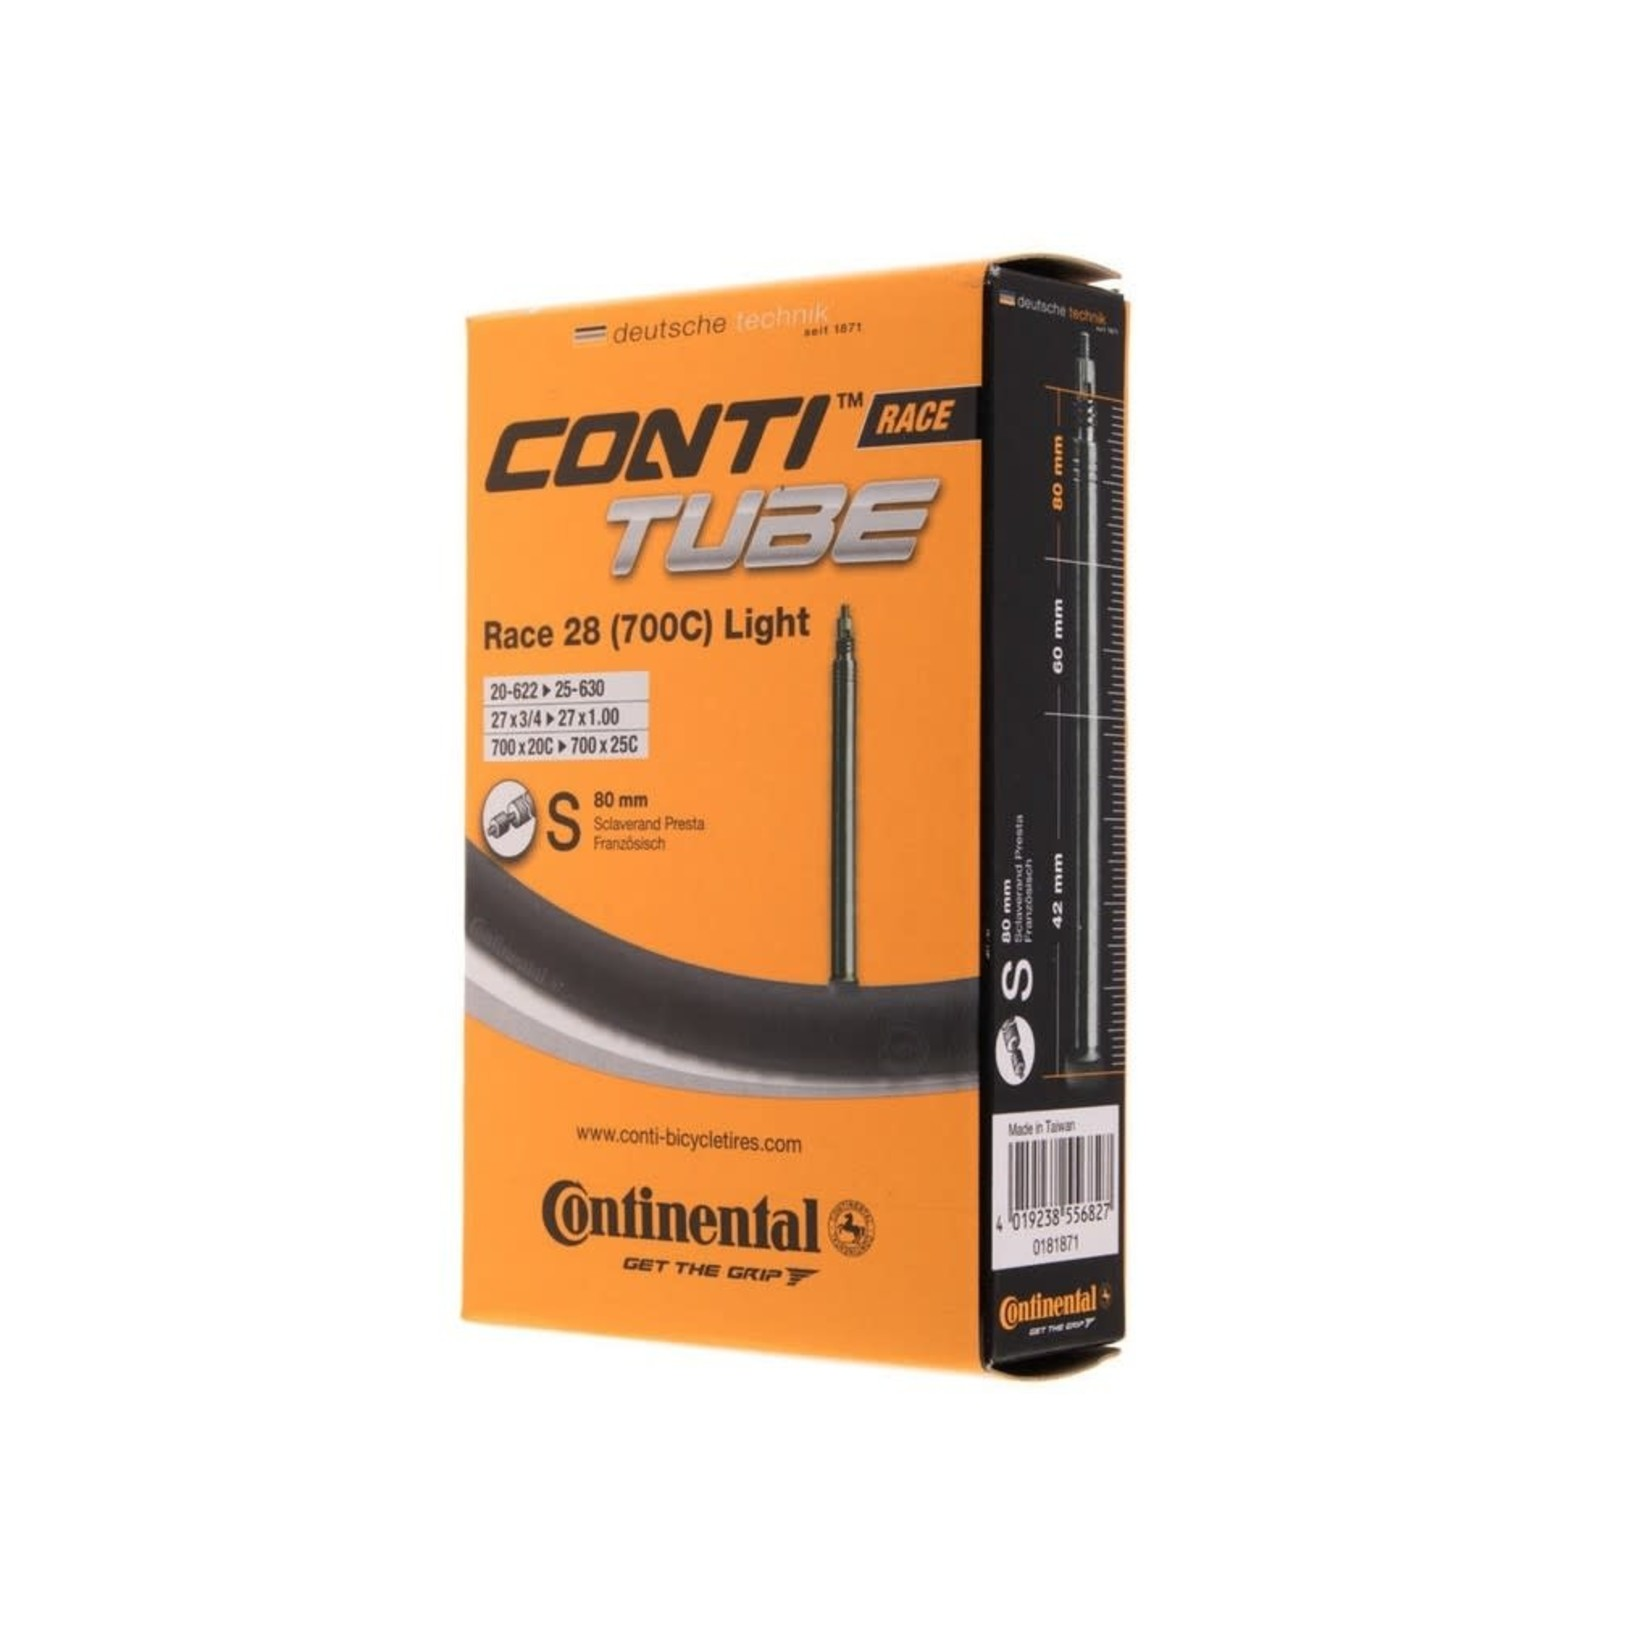 Continental Tube Continental 700 x 18-25mm 80mm LigPresta Valve